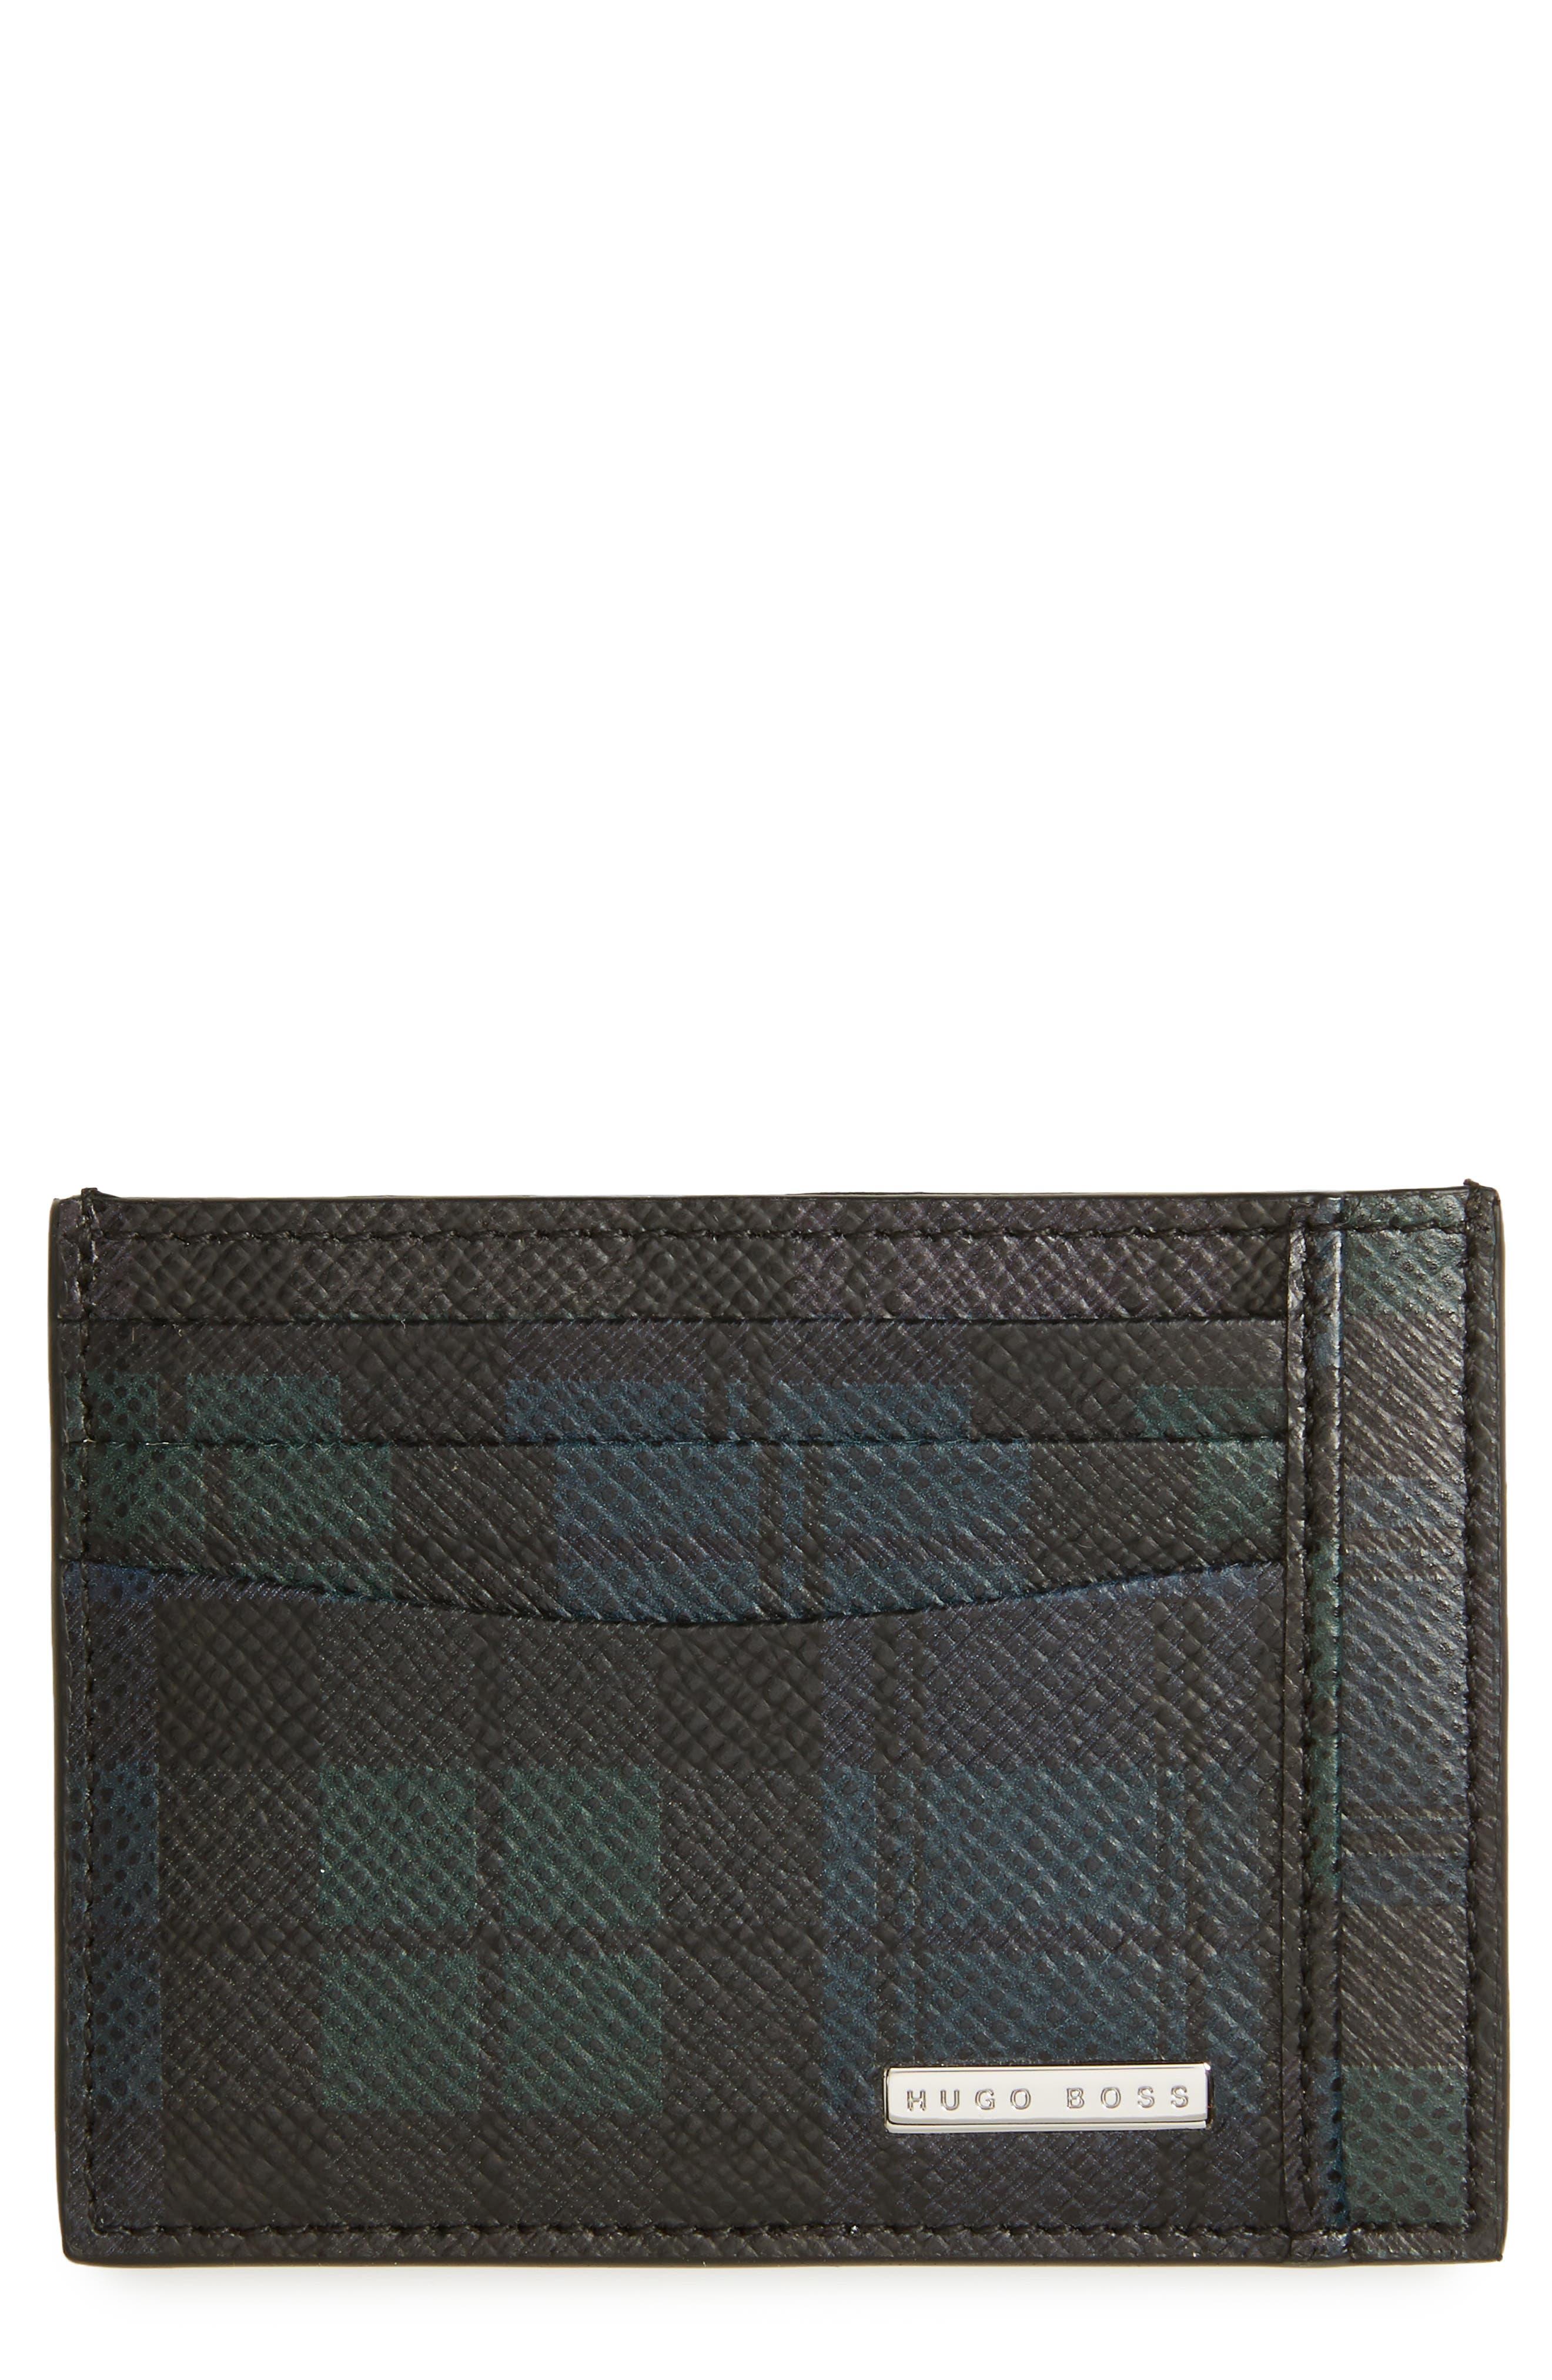 Signature Leather Card Case,                             Main thumbnail 1, color,                             016